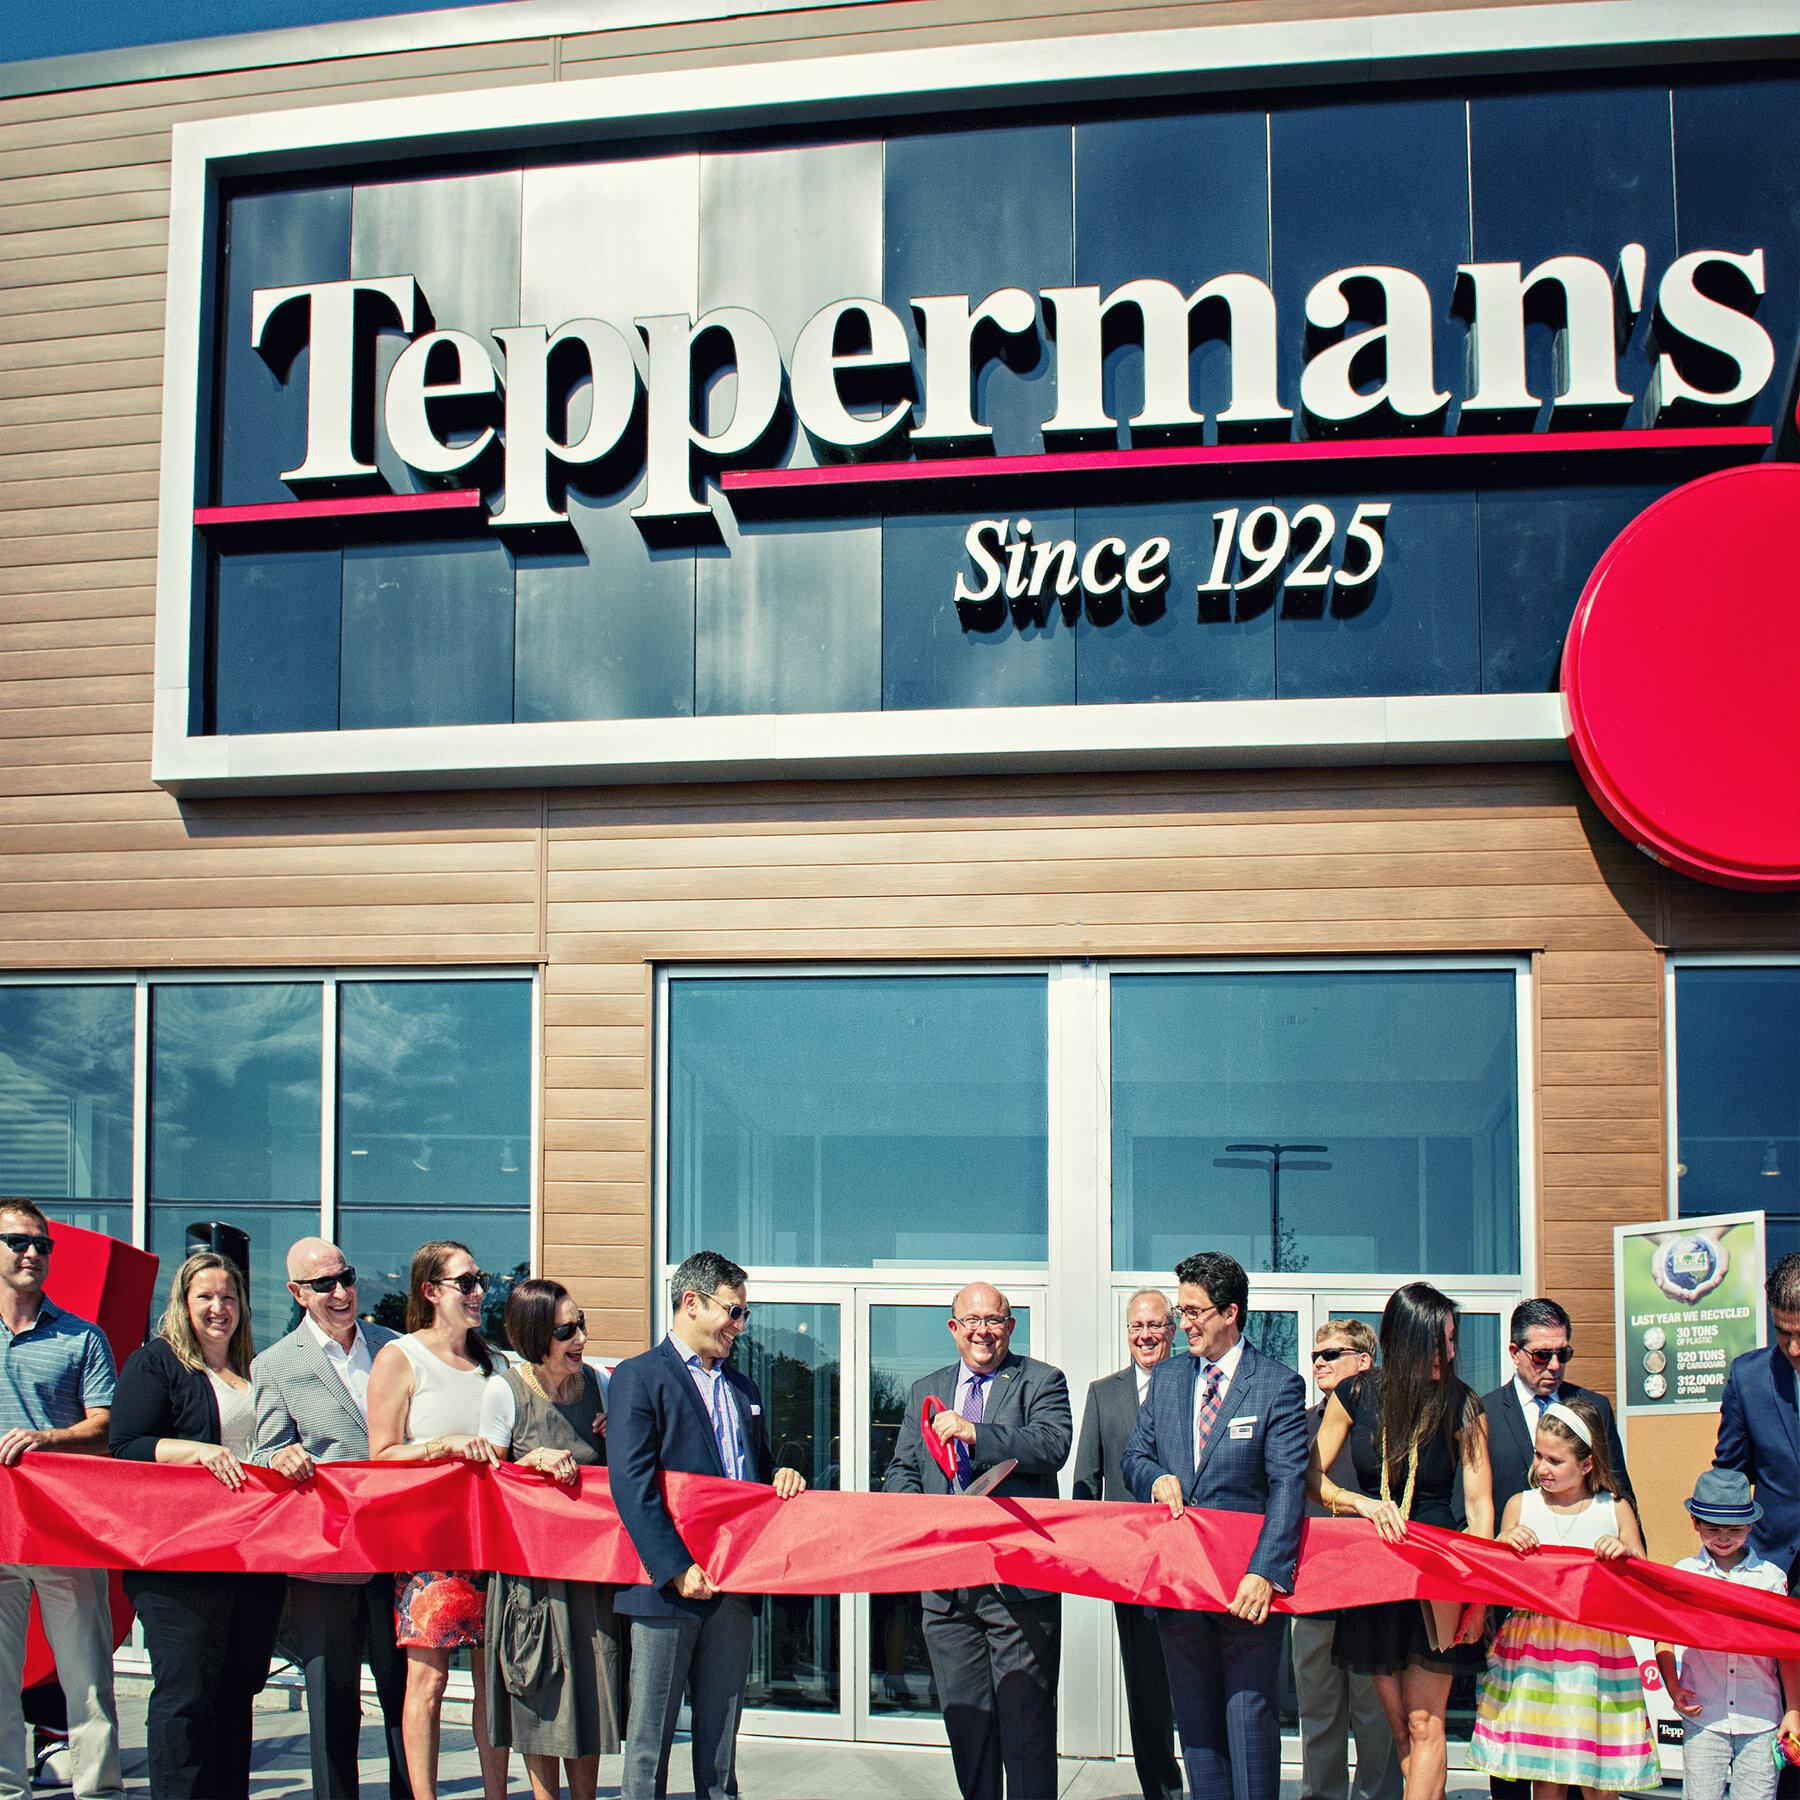 tepperman's.jpg